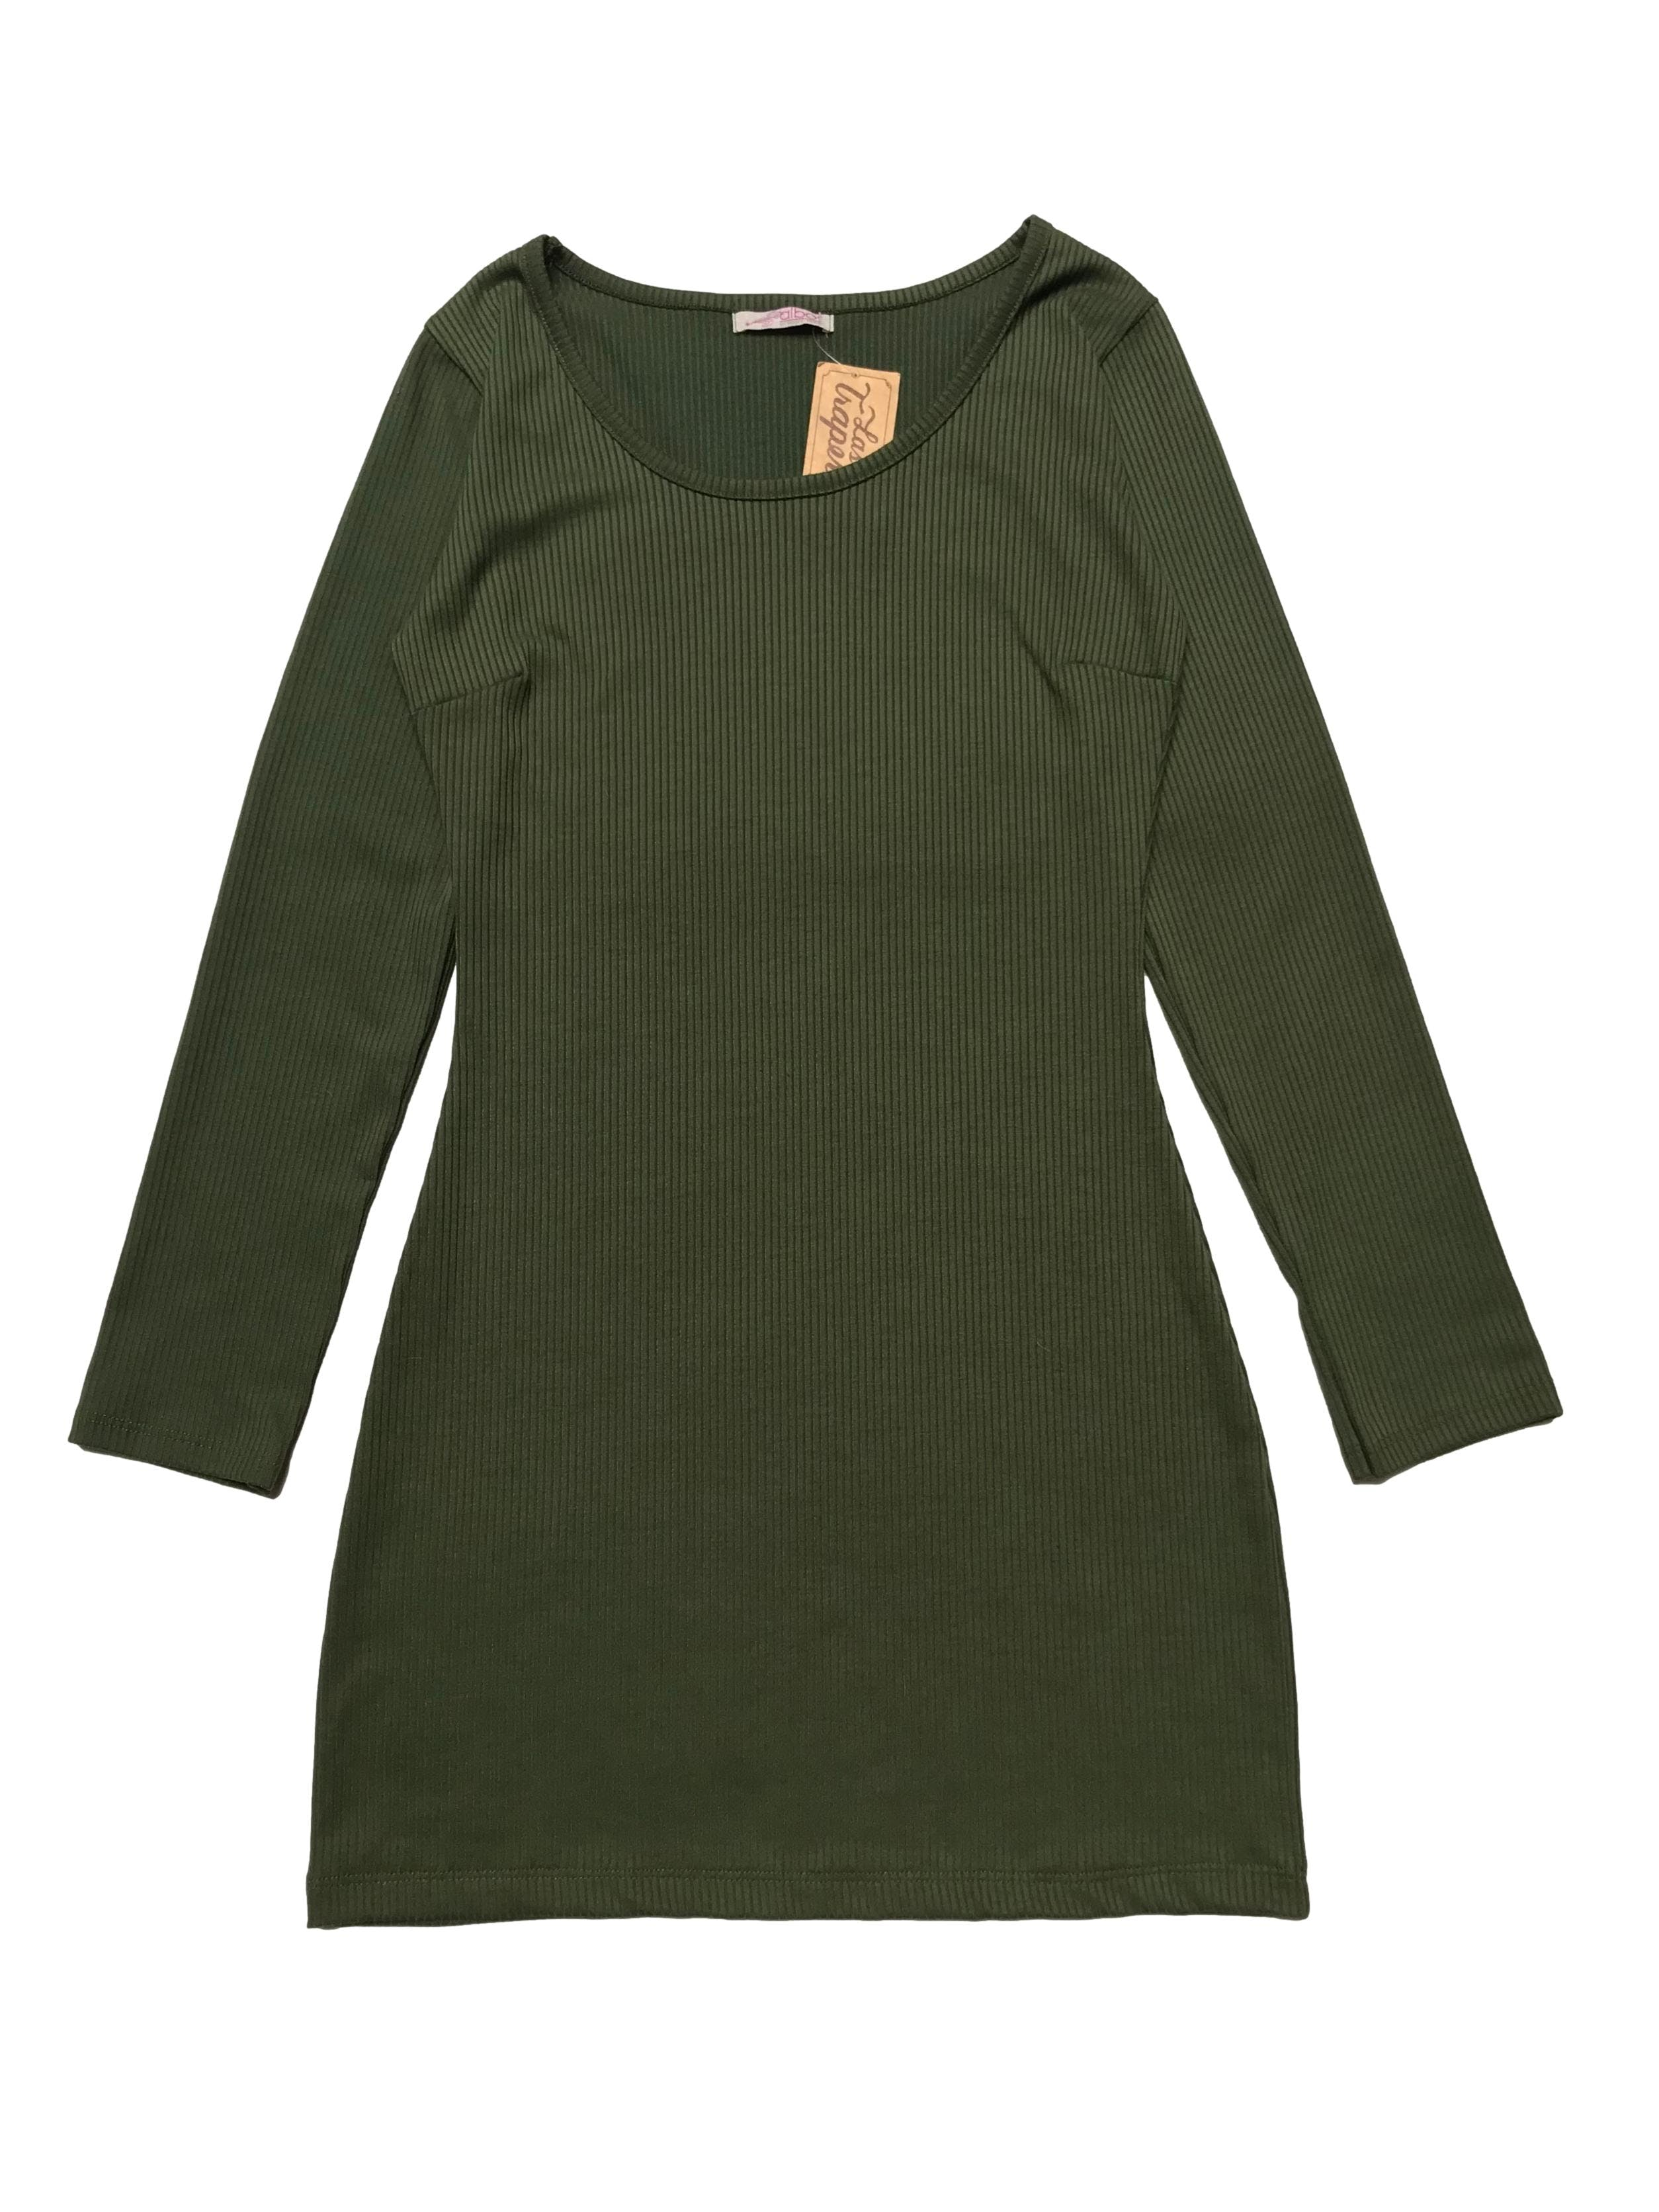 Vestido verde manga larga de tela con textura en líneas. Largo 76cm